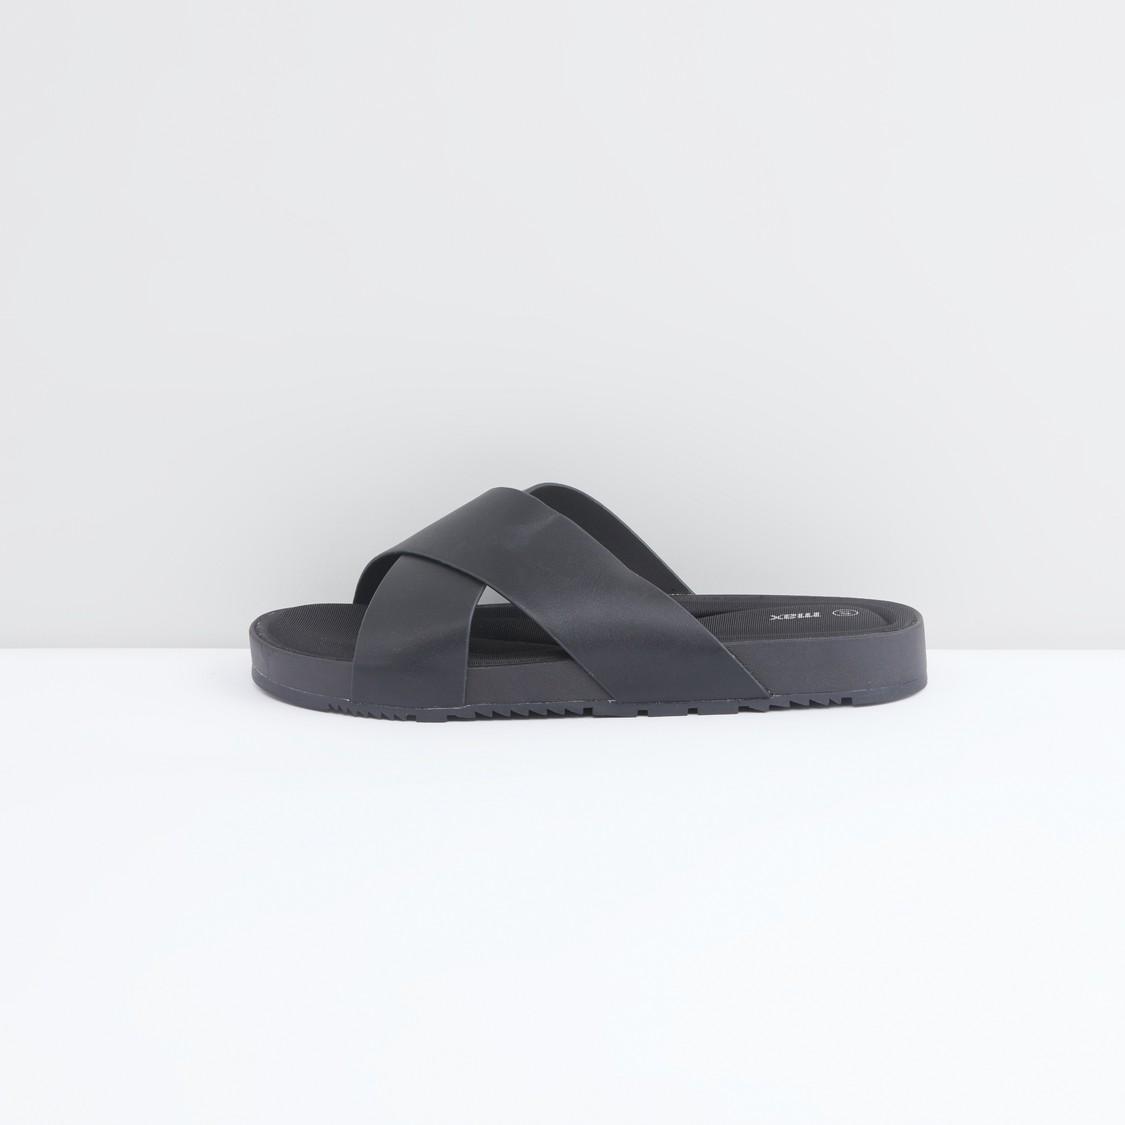 حذاء خفيف بحزام متقاطع